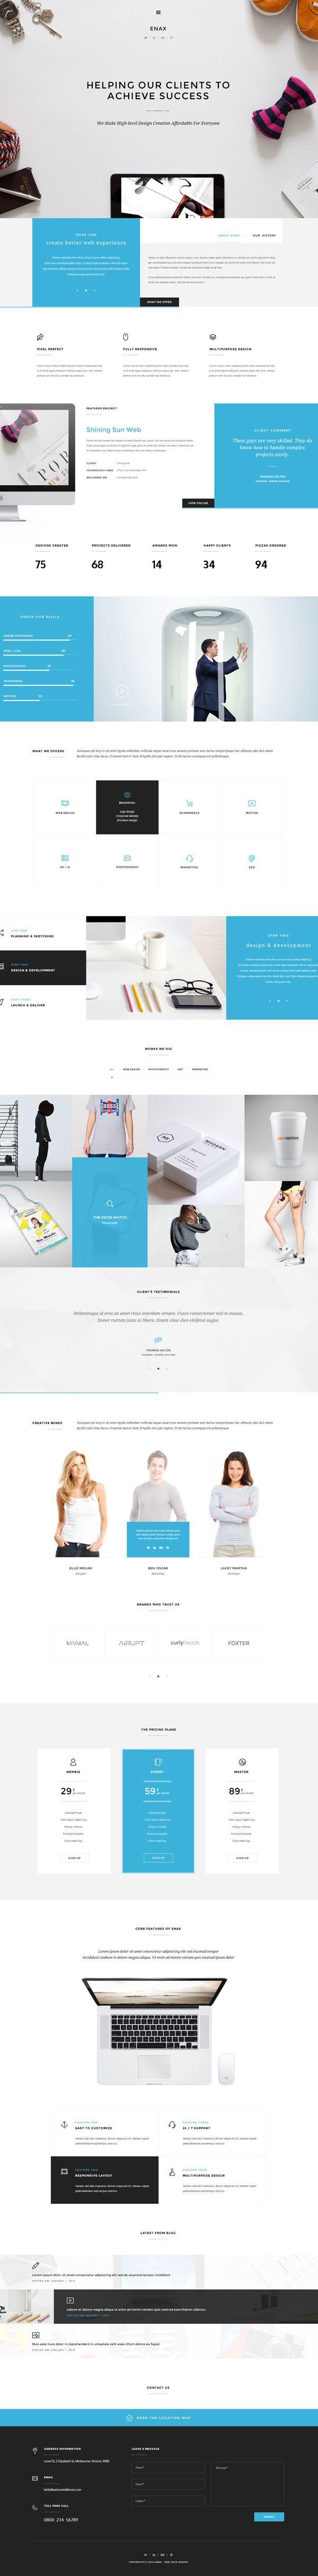 Enax - A Stylish and Modern Corporate Theme #html5wordpressthemes #responsivedesign #wordpressthemes